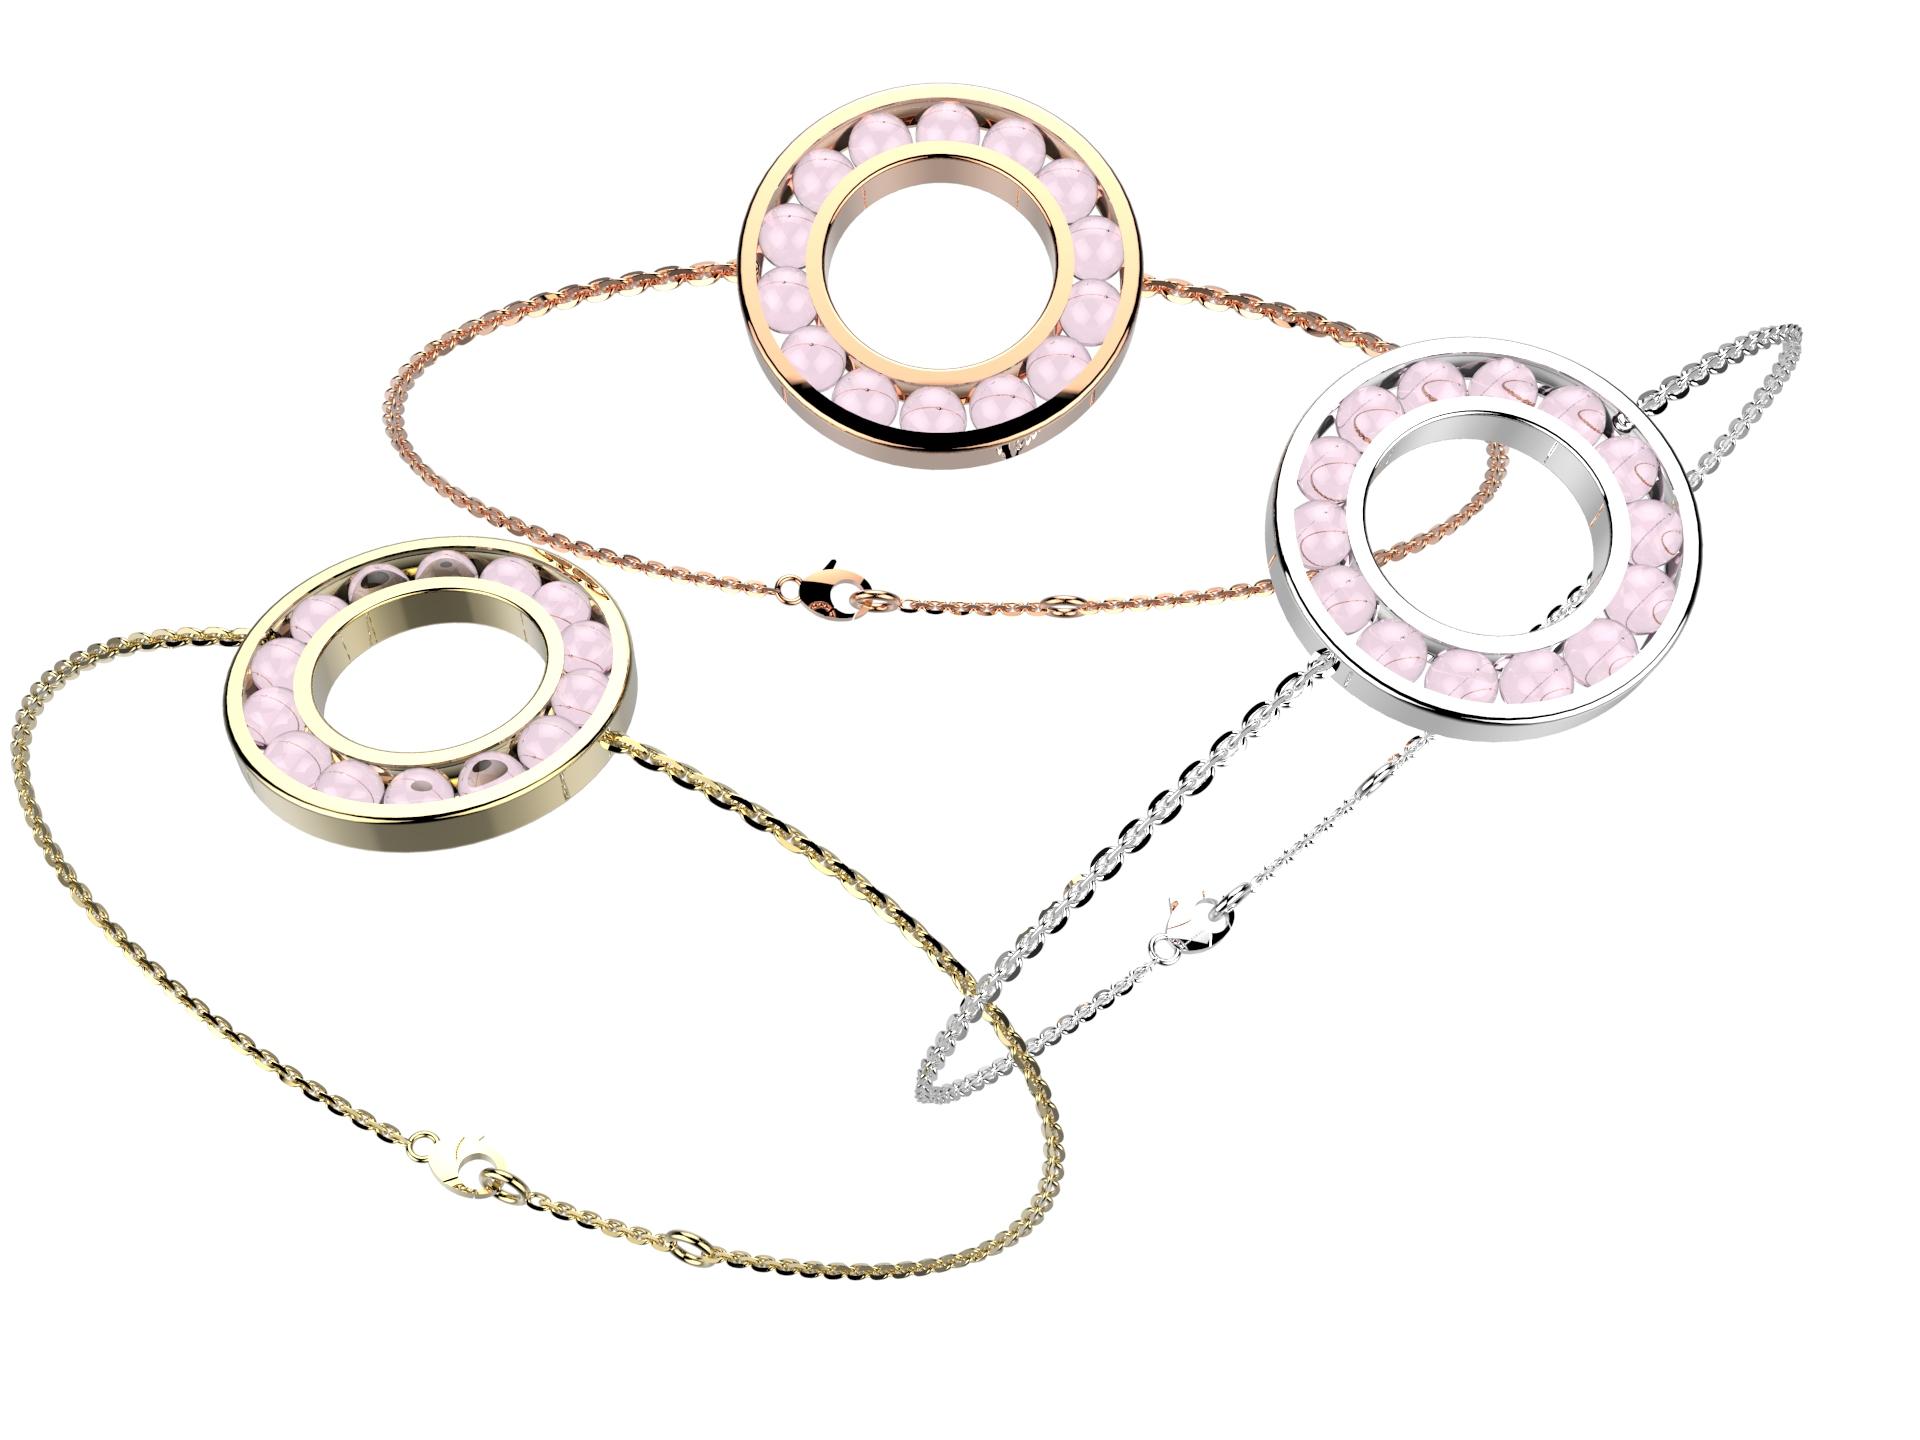 Bracelet chaine or qz rose 720 €